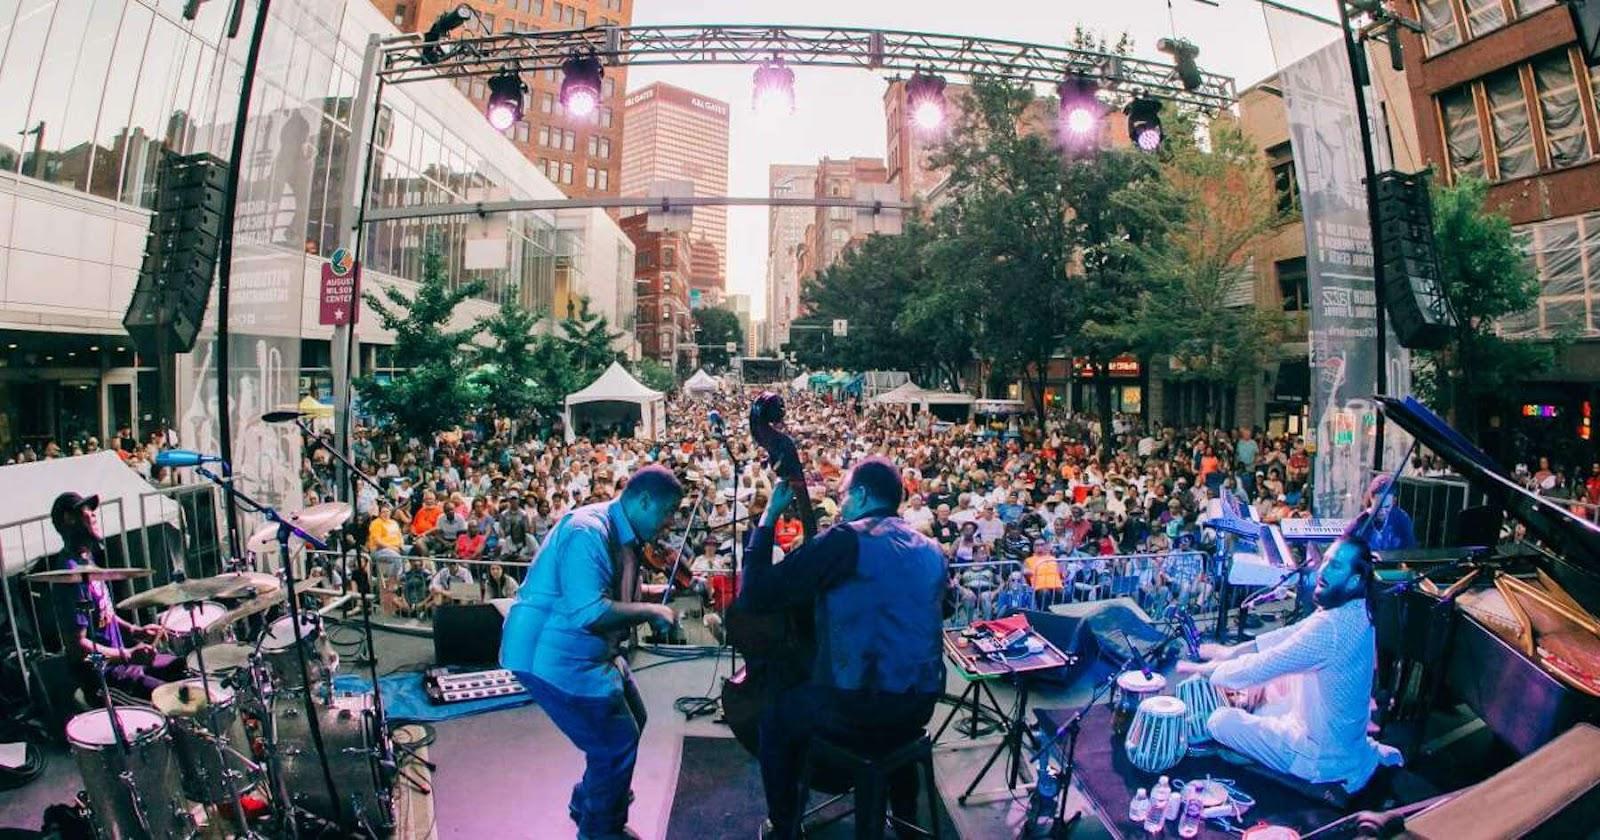 Pittsburgh international jazz festival